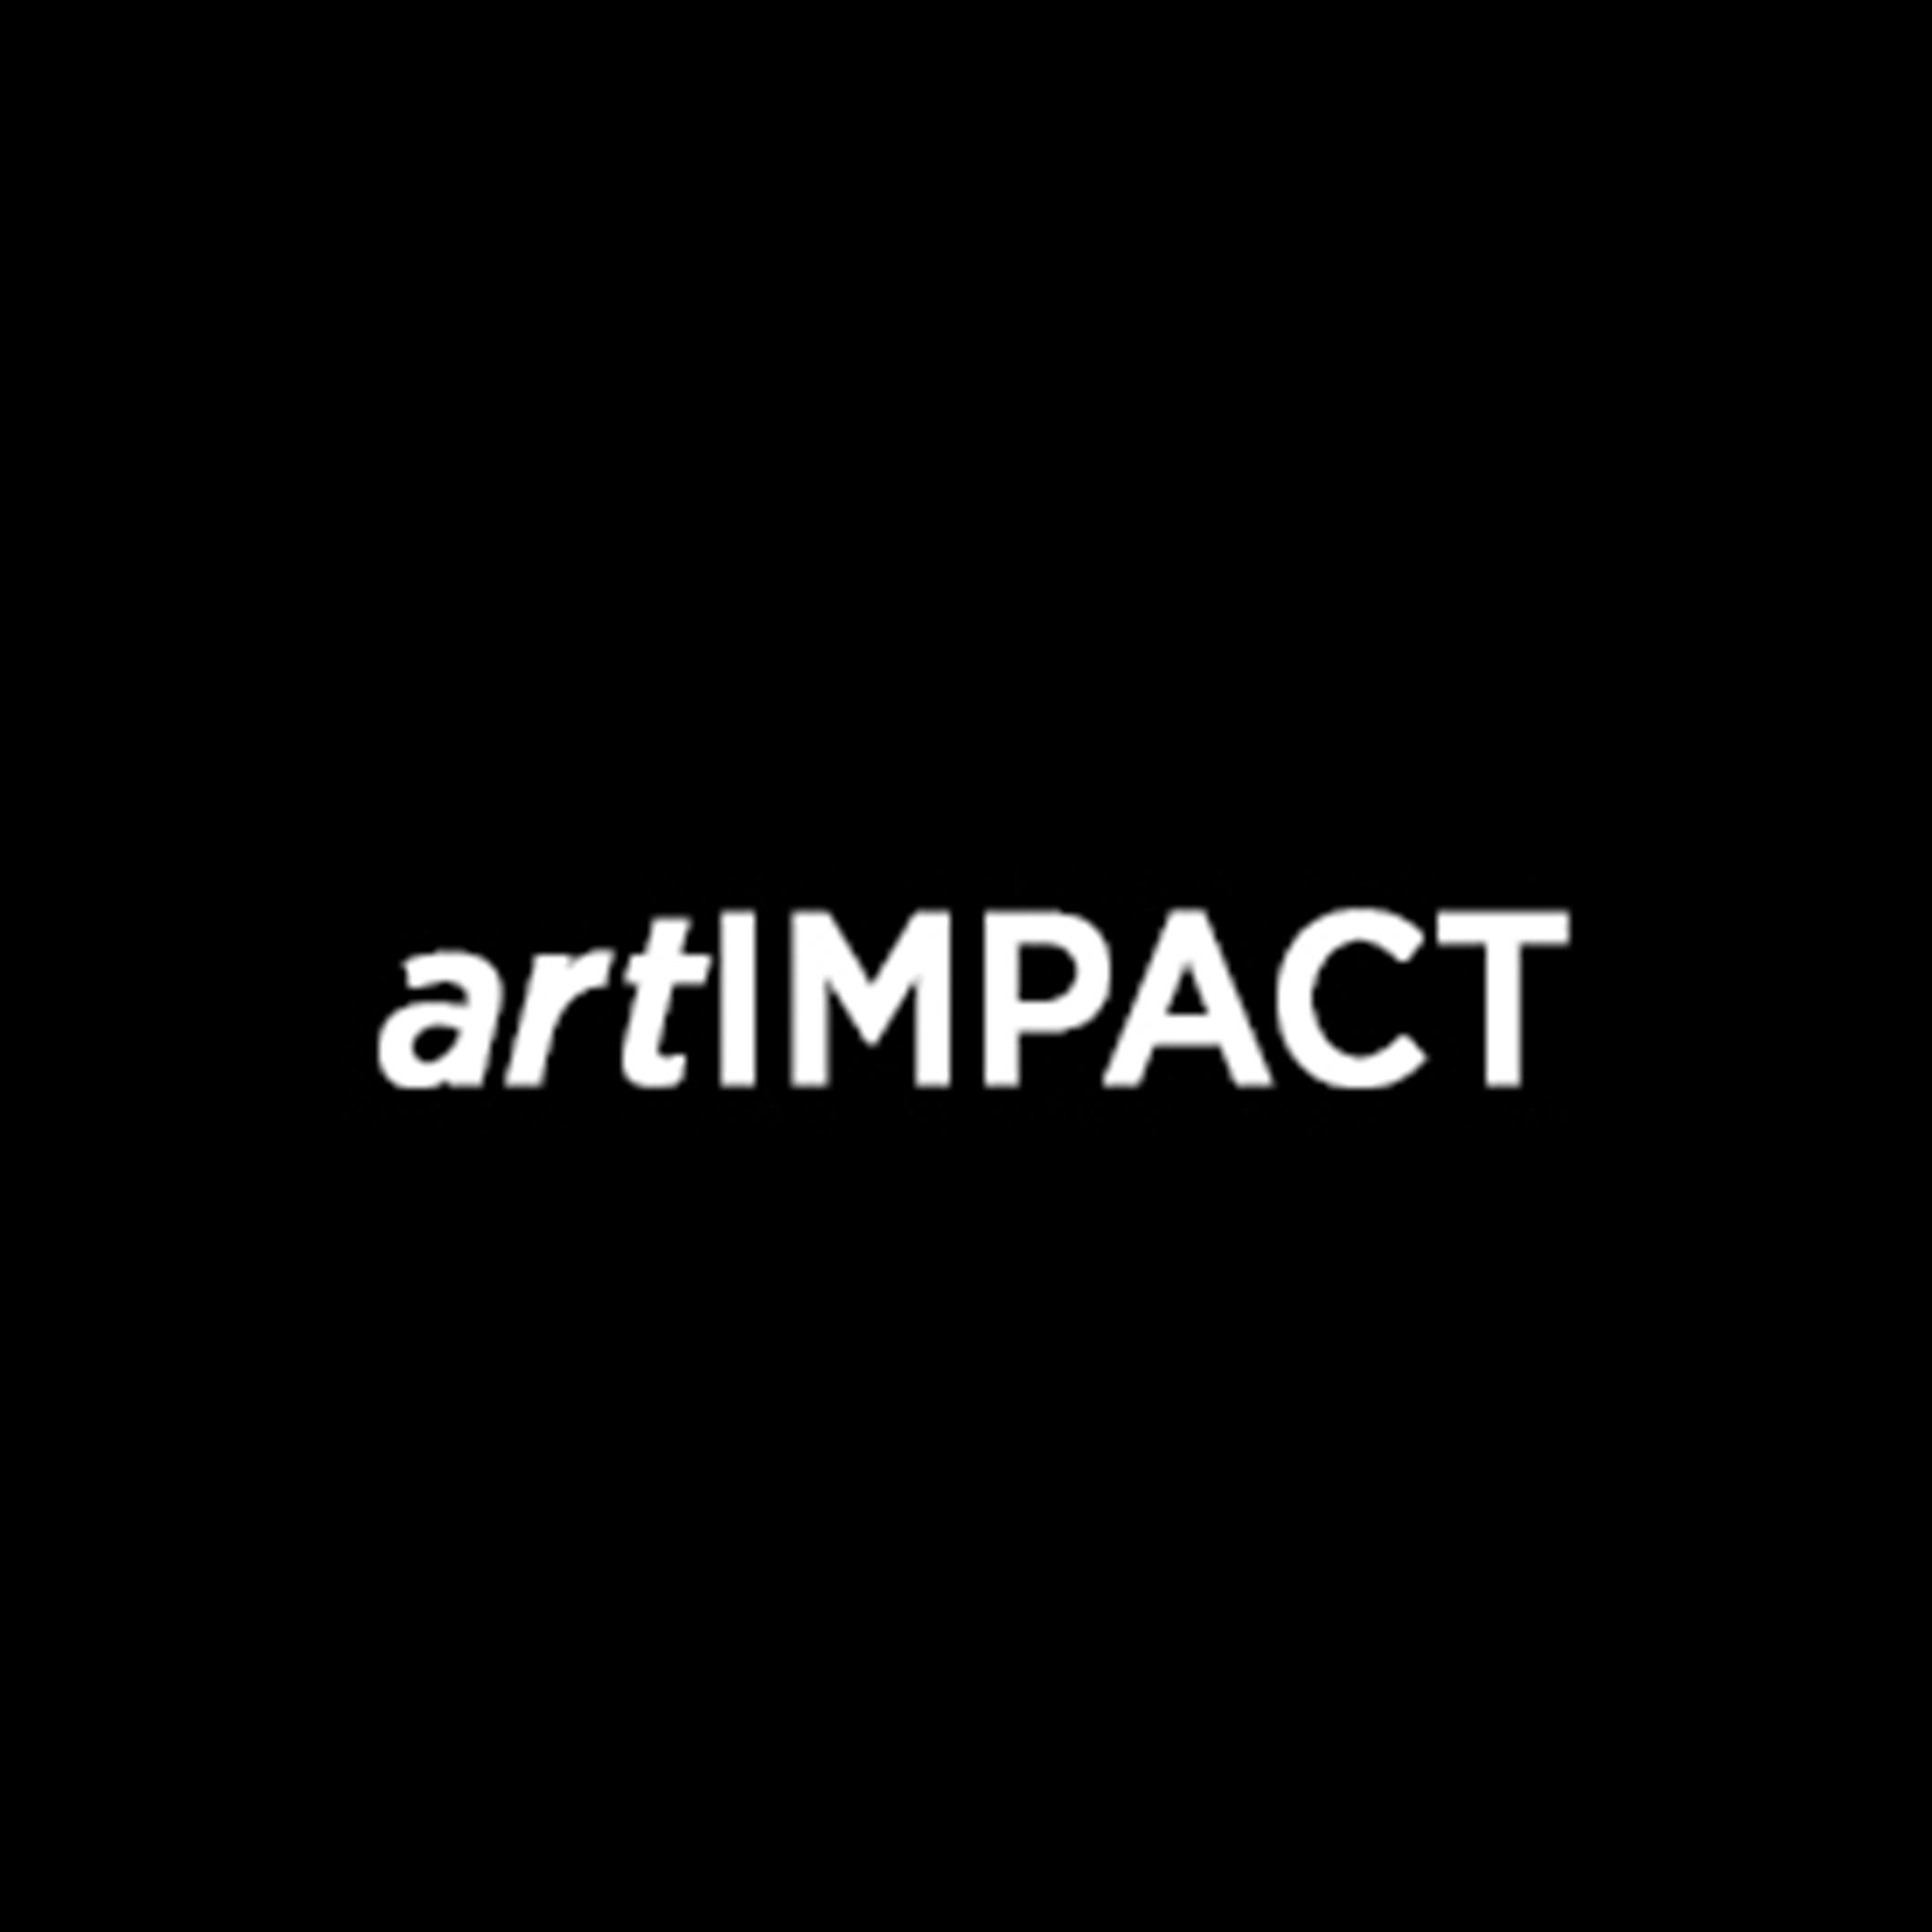 art_impact.png